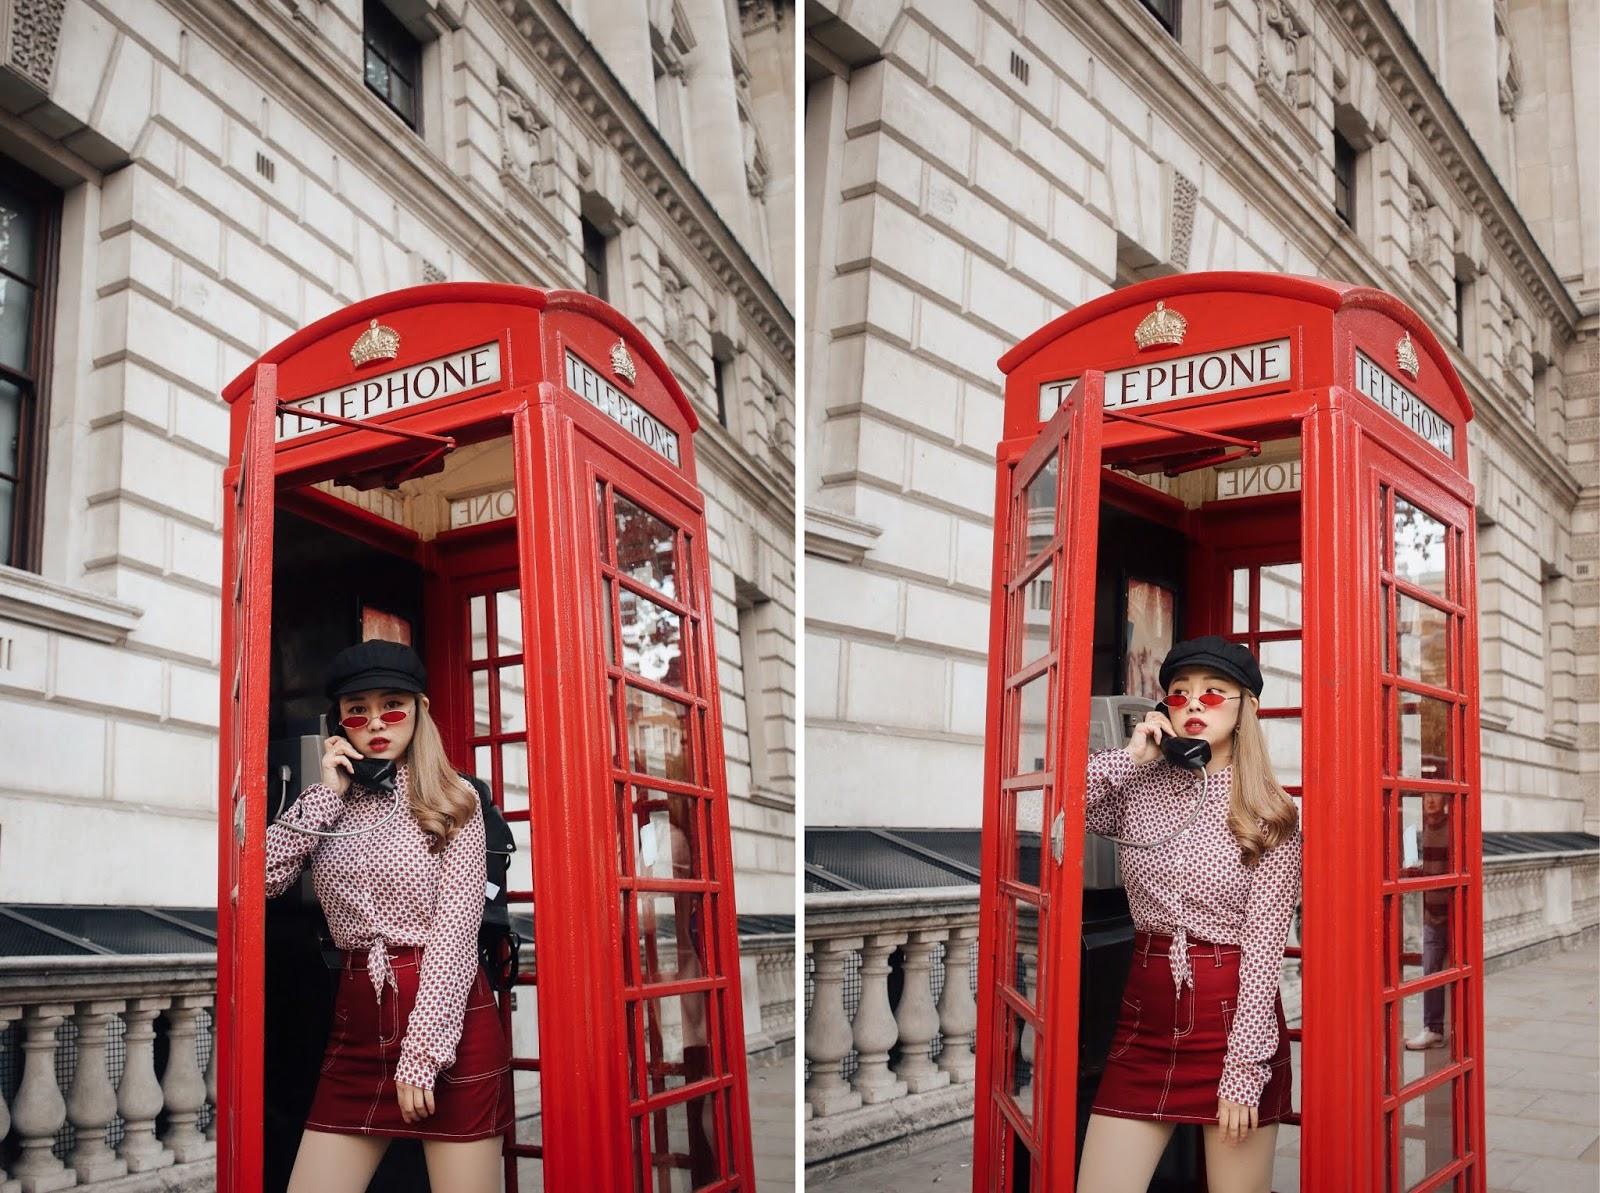 OUR EUROPE HONEYMOON: LONDON - CARMEN LAYRYNN | MALAYSIA BEAUTY